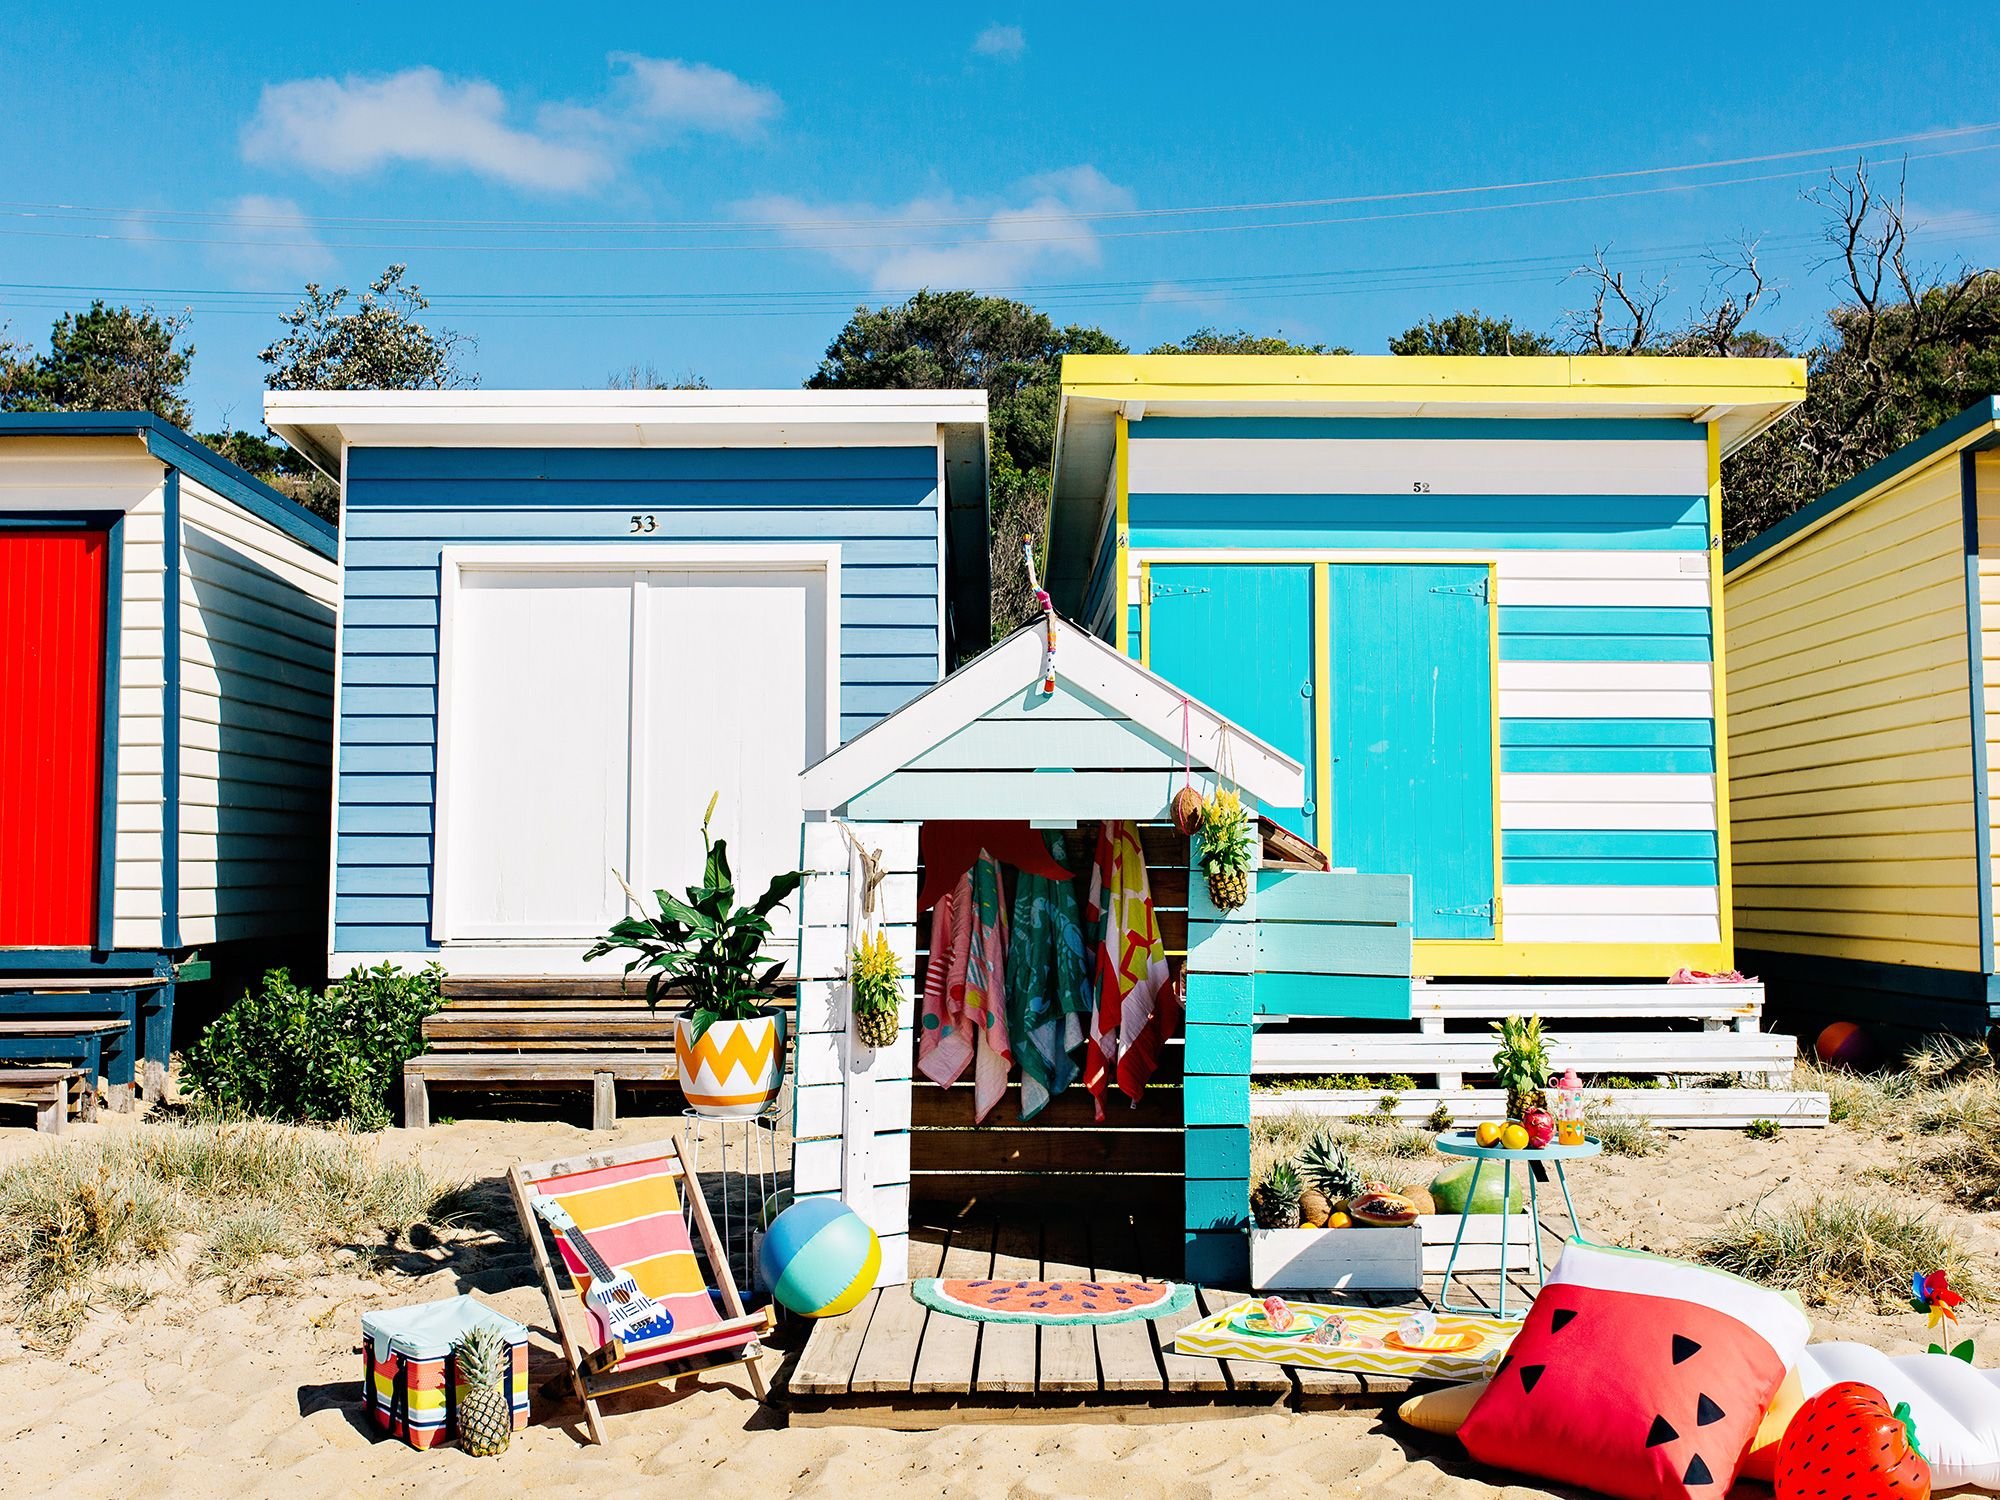 designer cubby houses Home Design 40+ Designer Cubby Houses Gif